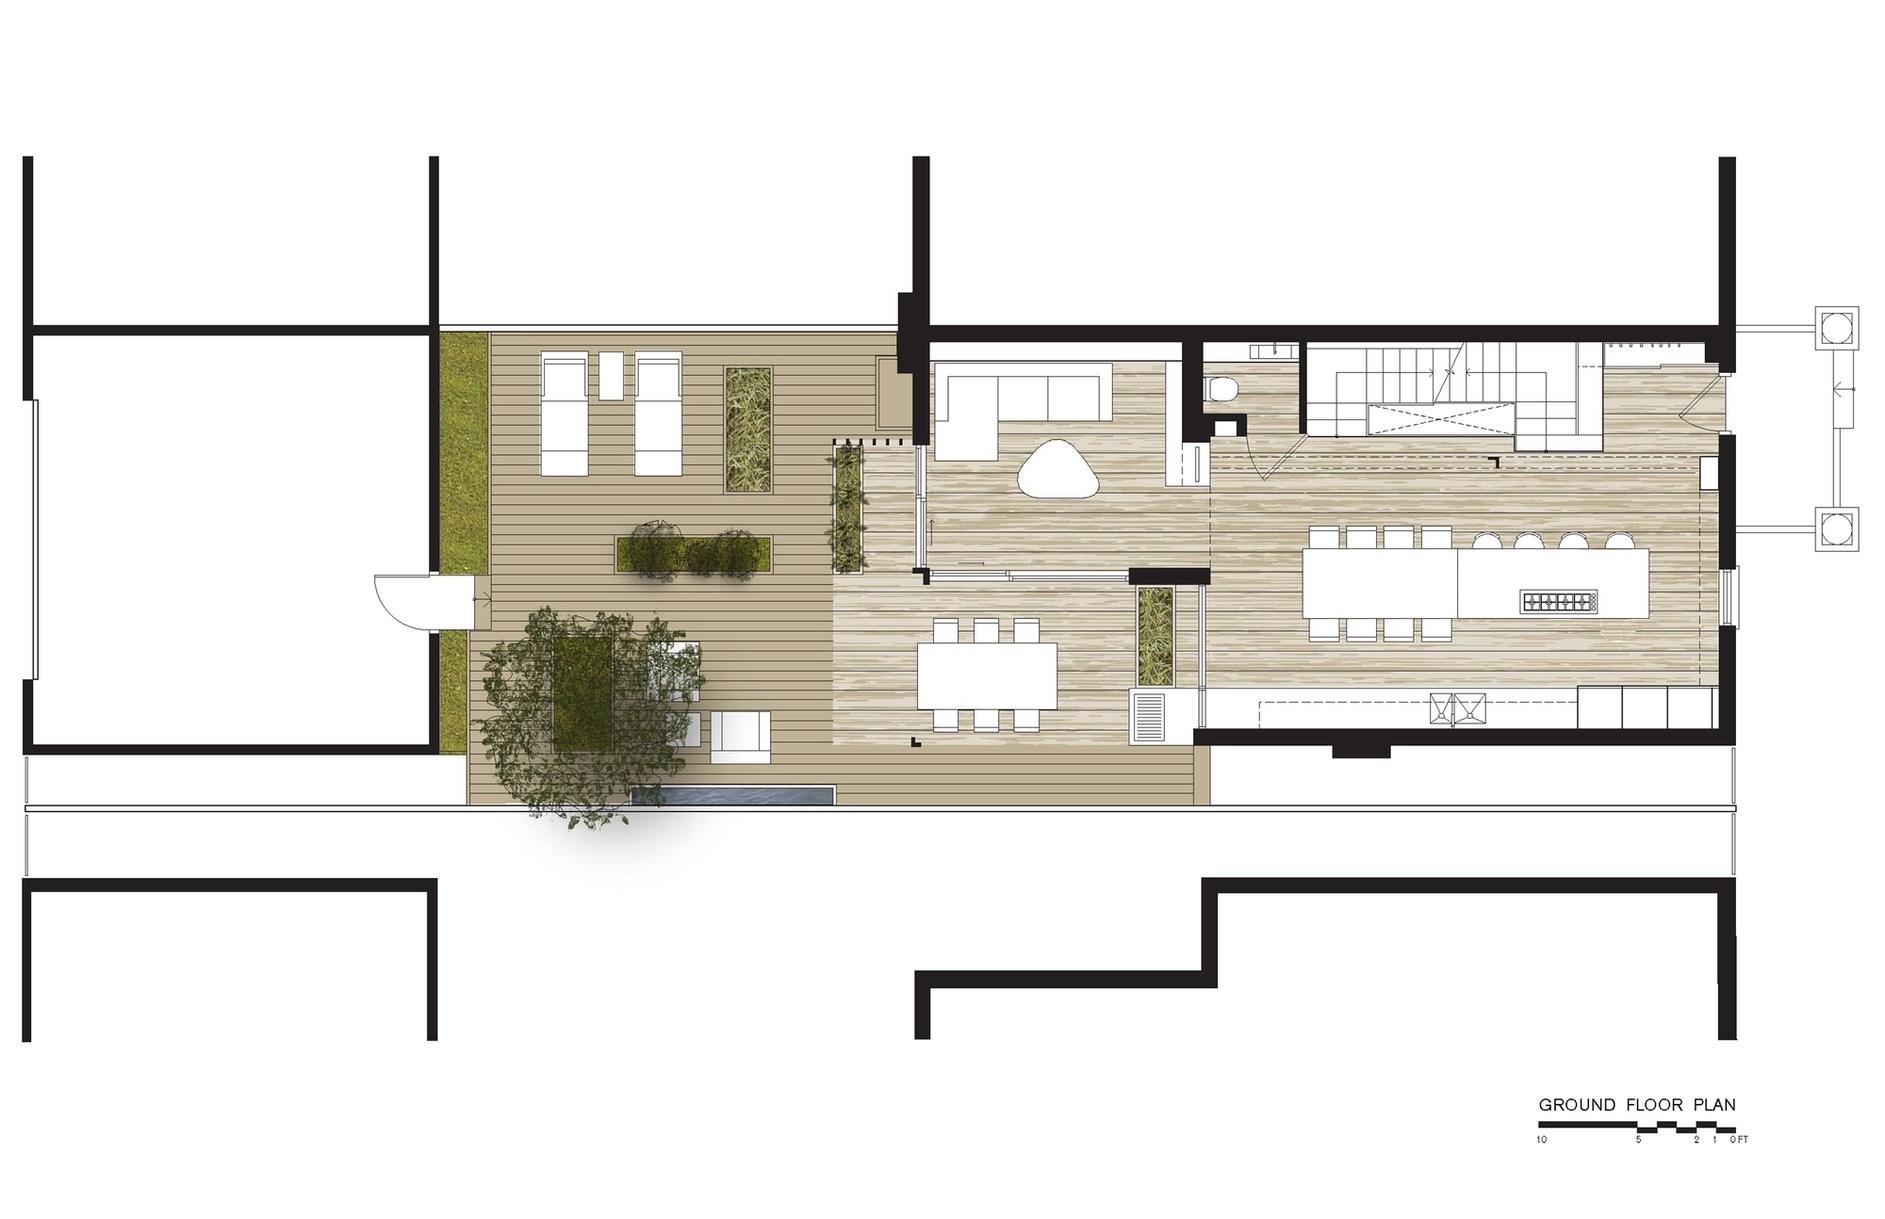 Through house by dubbeldam architecture design karmatrendz for Dubbeldam architecture and design s contrast house